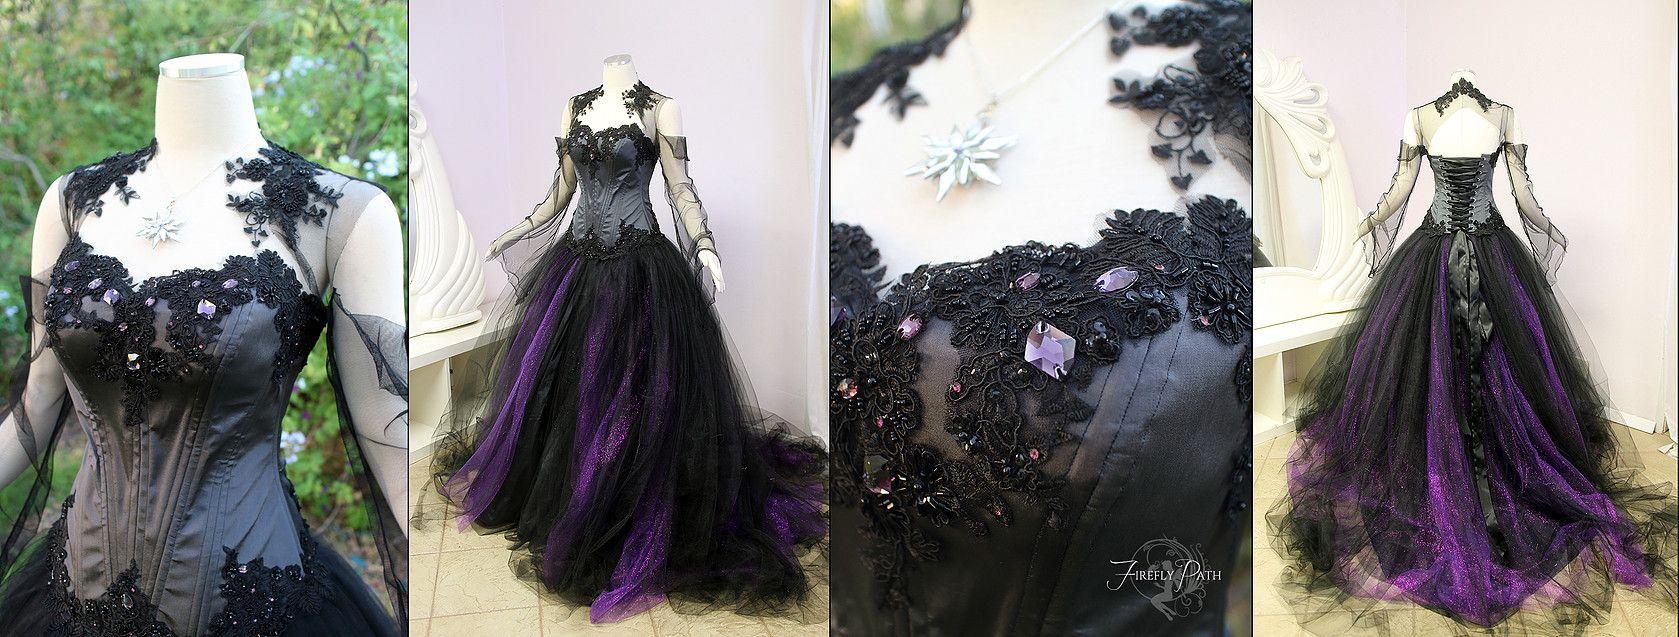 Fireflypathbridal assassin wedding pinterest halloween themes